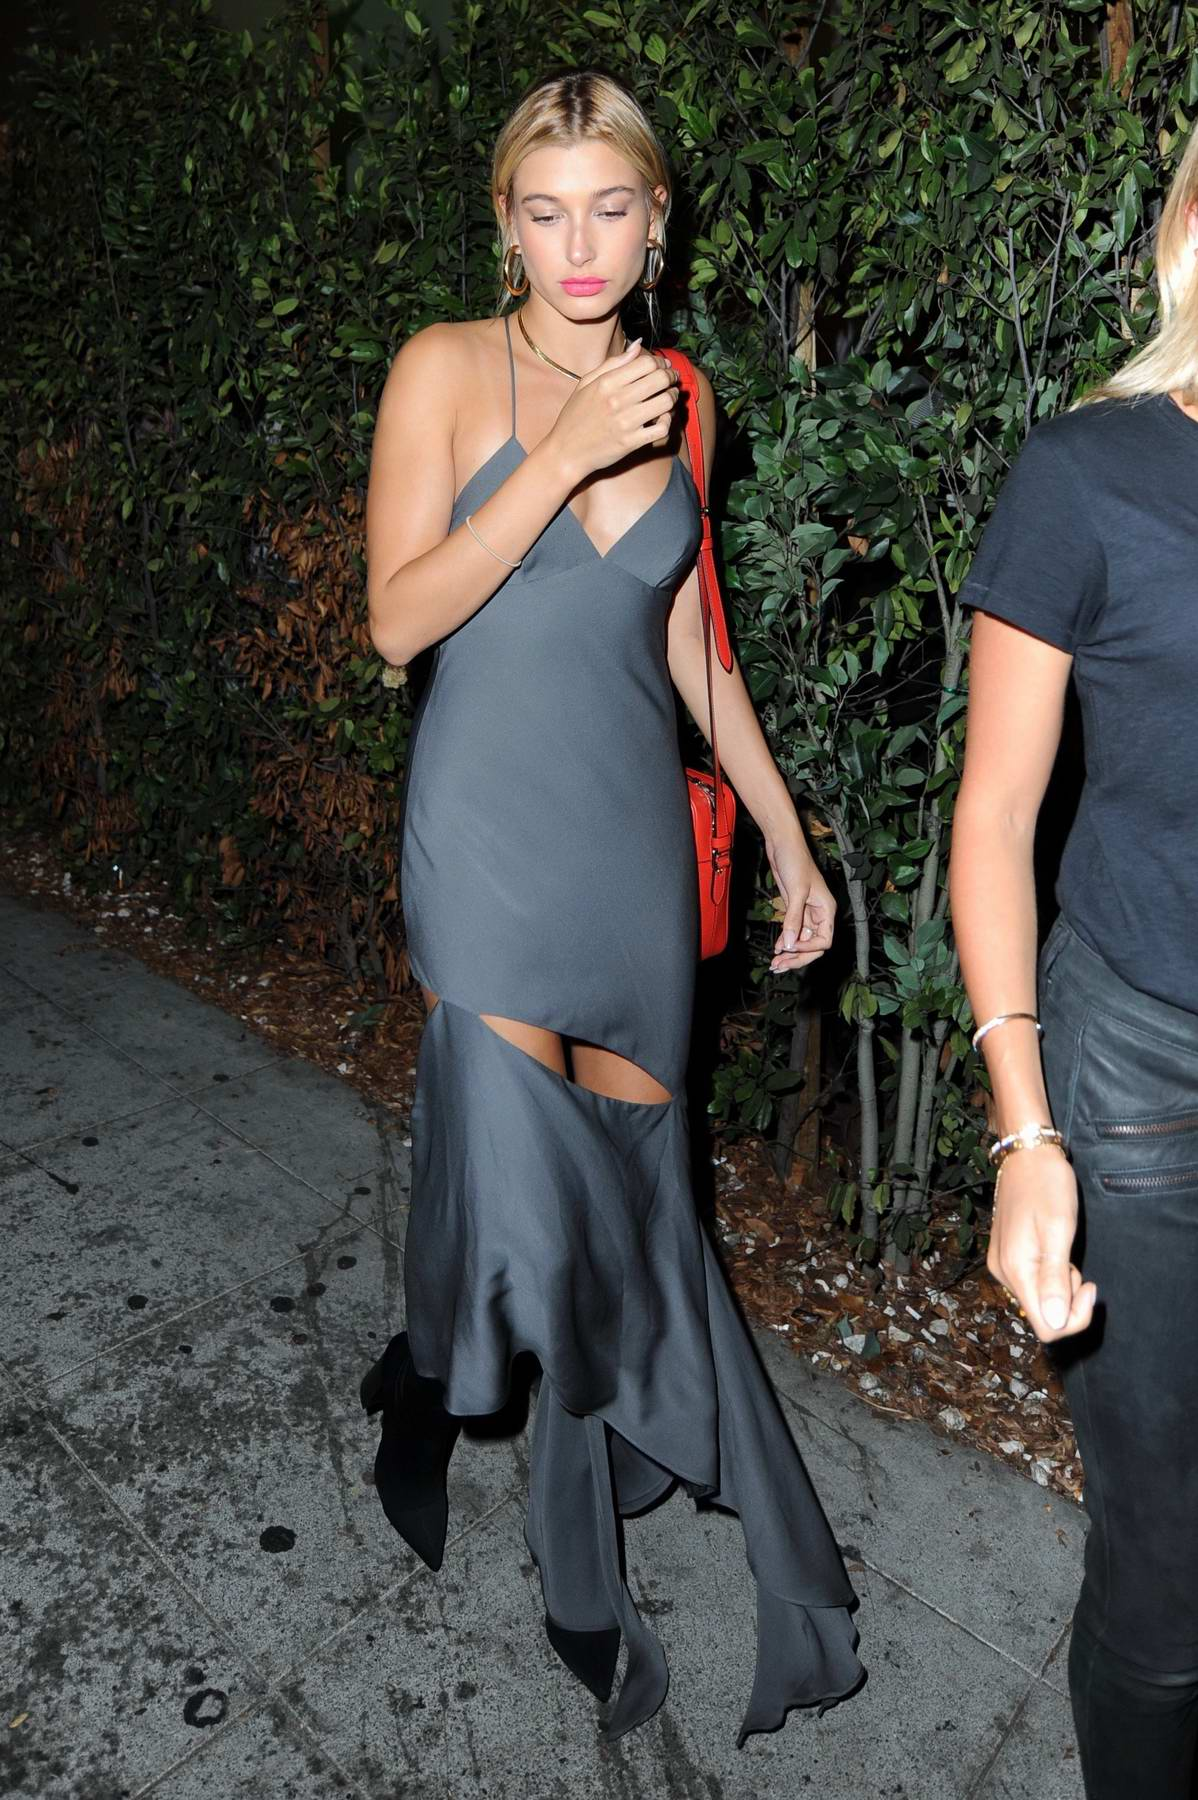 Hailey Baldwin leaving Delilah Night Club in West Hollywood